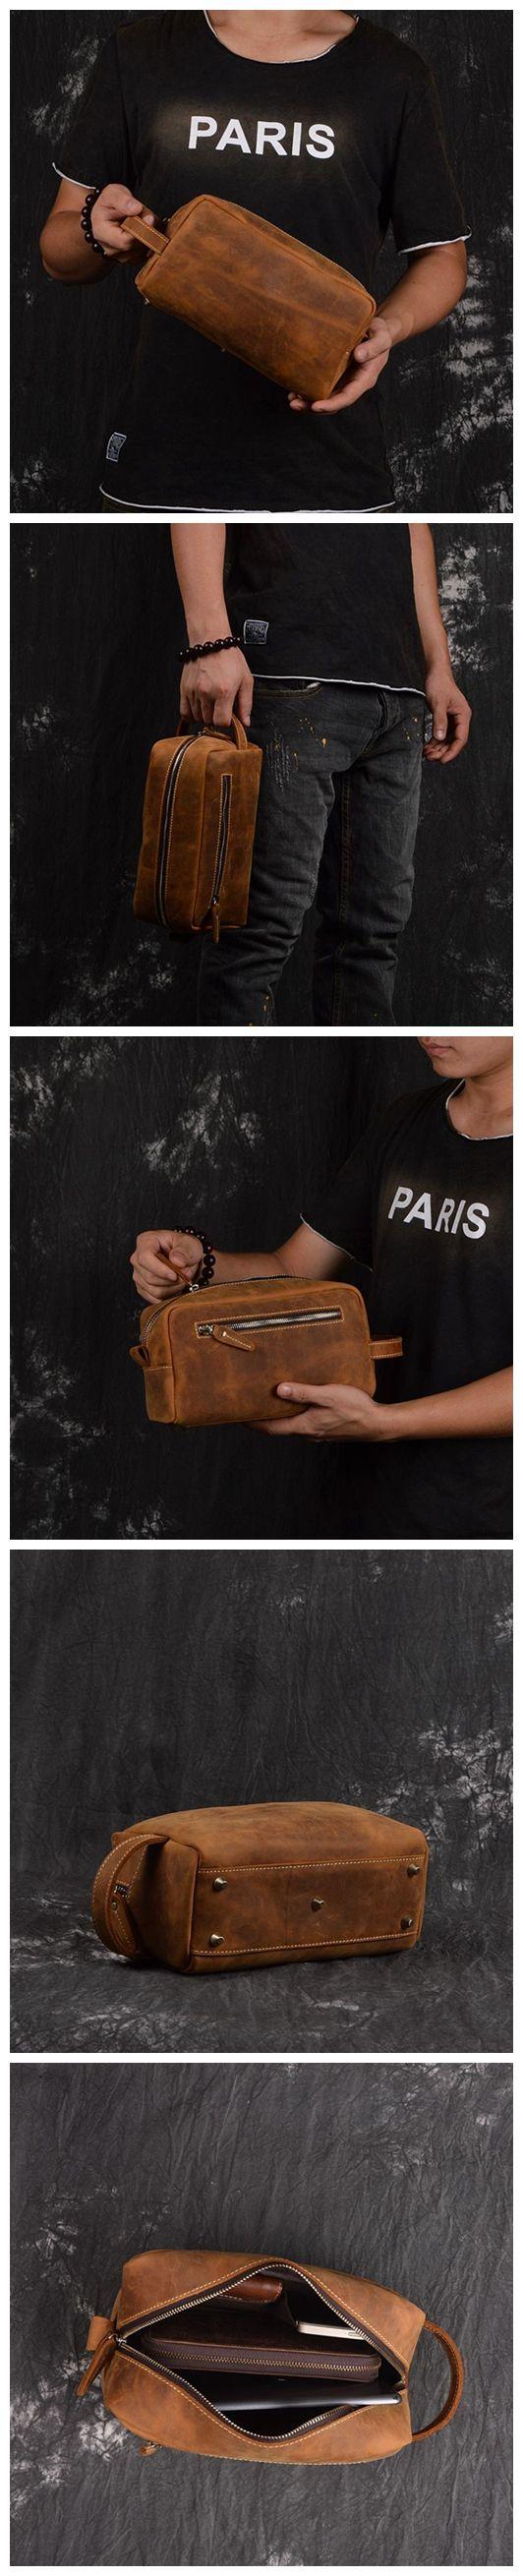 "Model Number: 2025 Dimensions: 9.8""L x 3.9""W x 5.1""H / 25cm(L) x 10cm(W) x 13cm(H) Weight: 1.5lb / 0.7kg Hardware: Brass Hardware Color: Vintage Brown / Dark Brown Features: • Genuine Natural Leather"